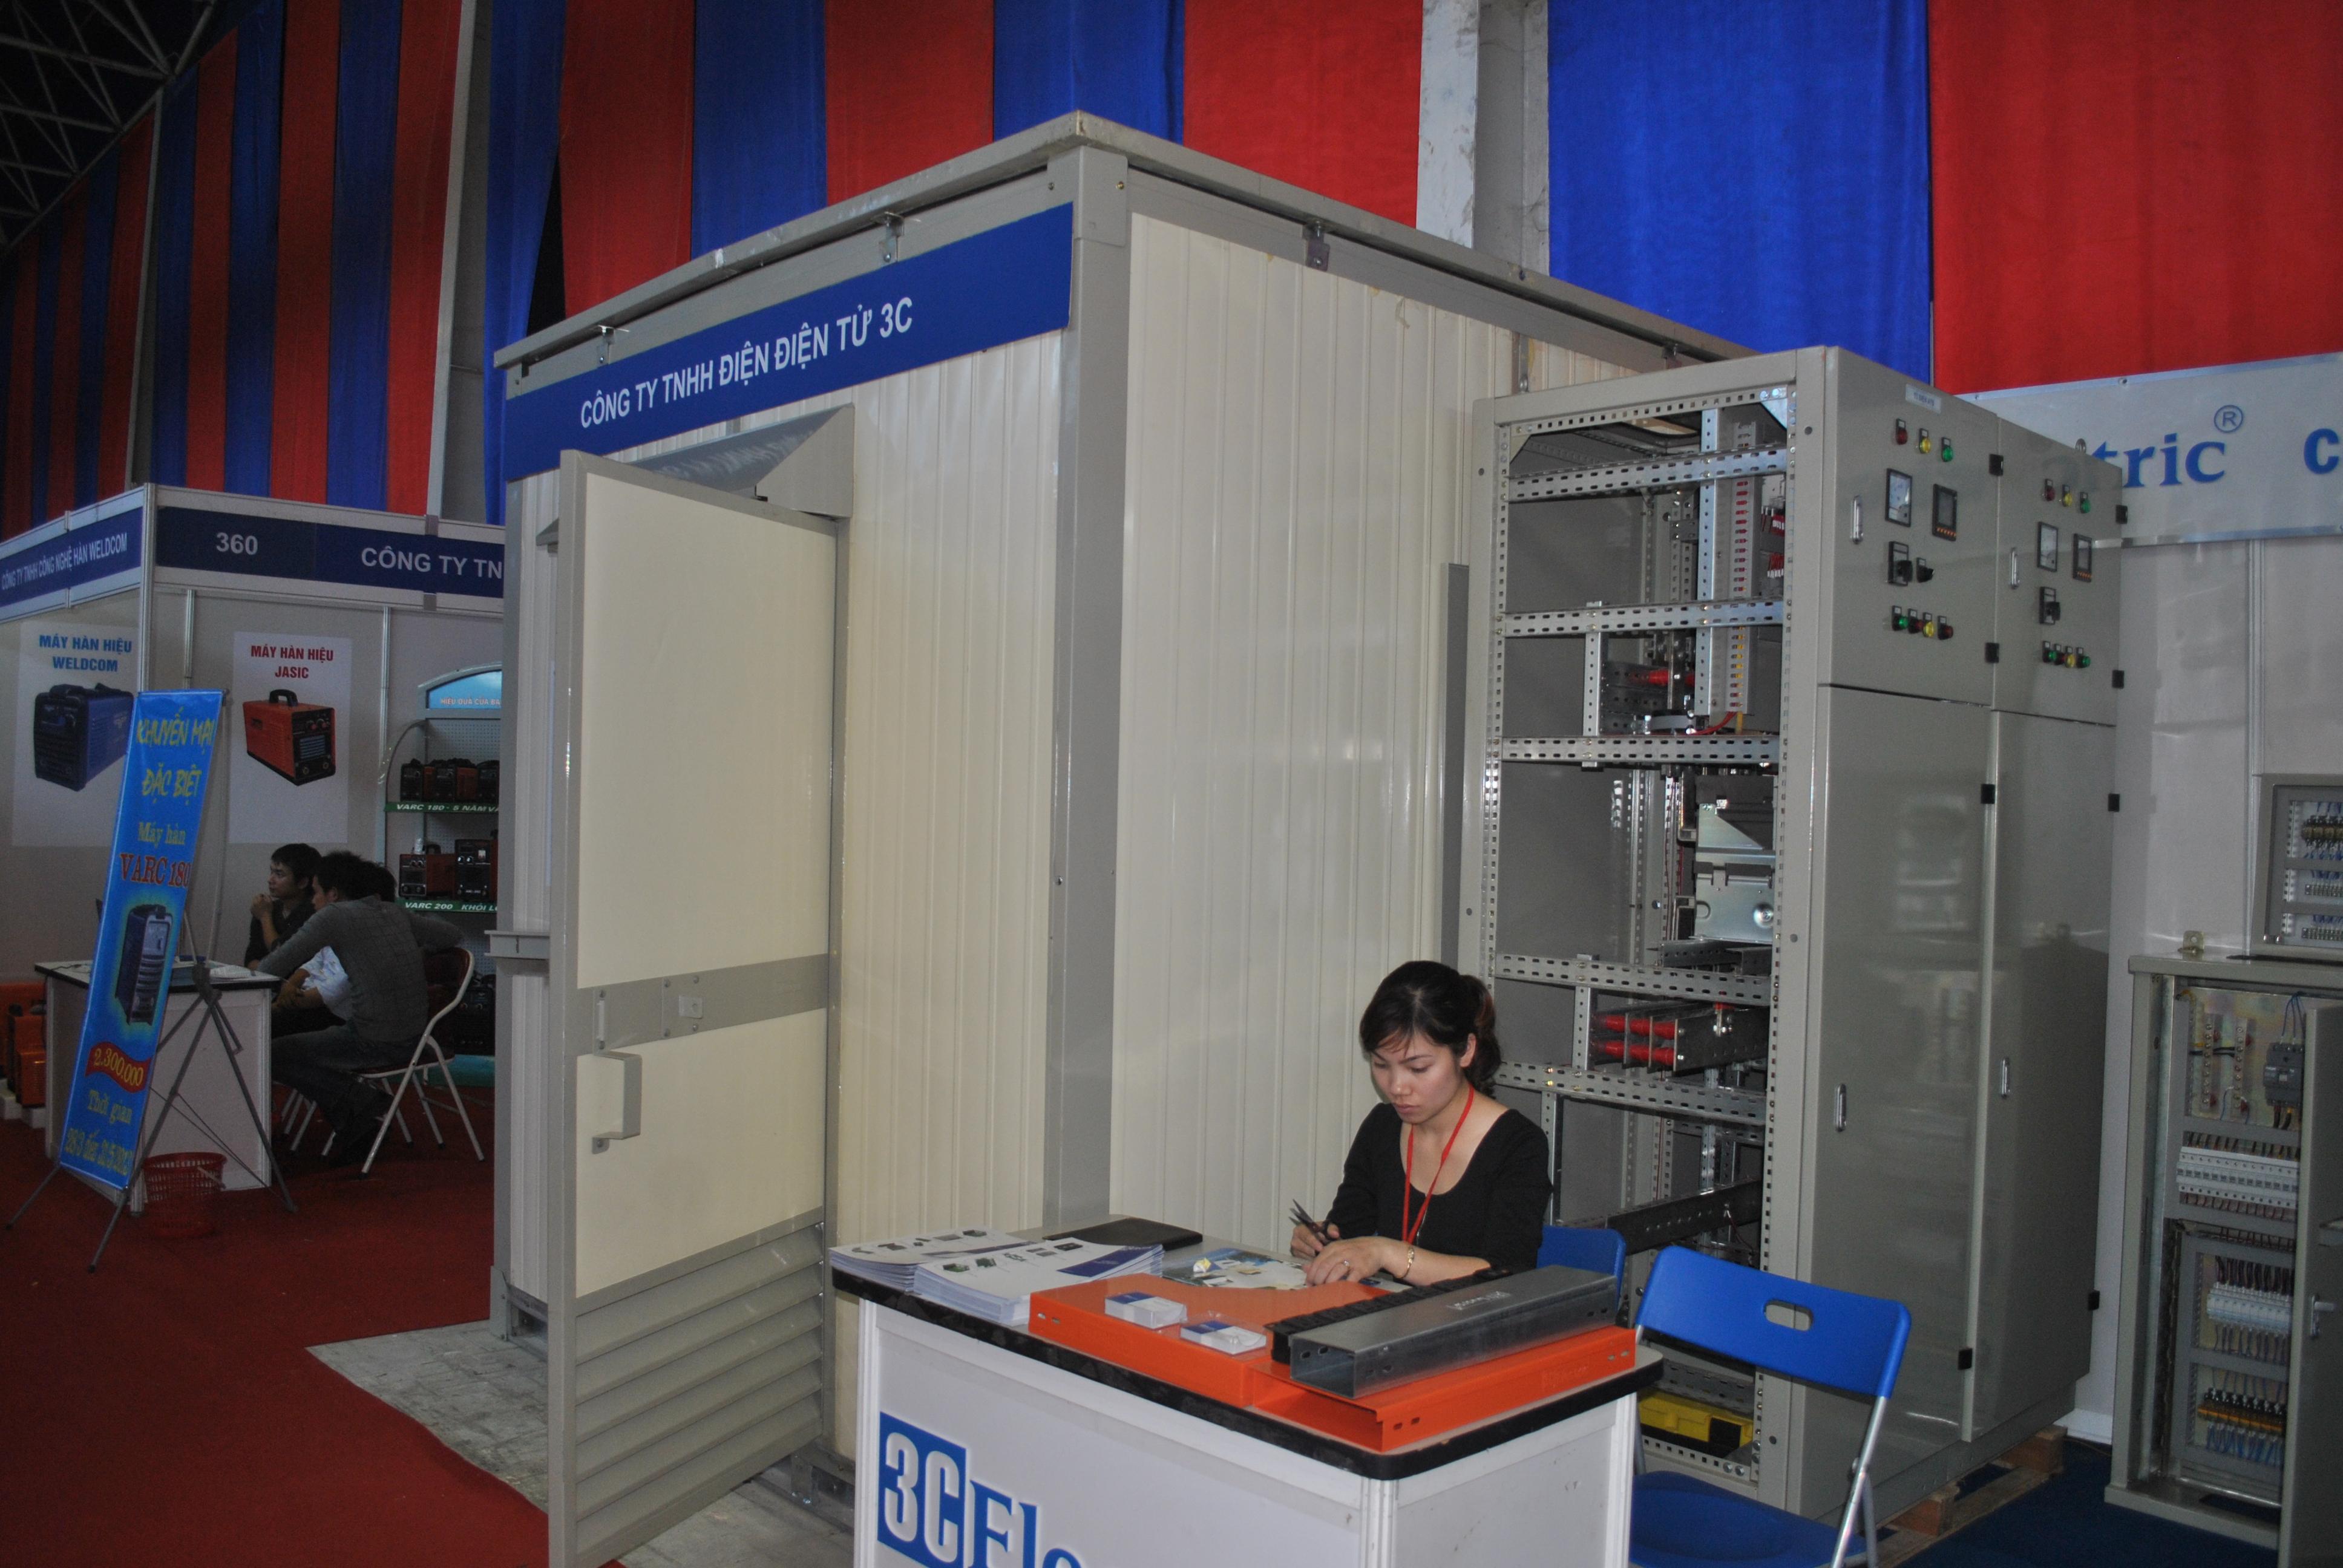 3C Electric tham dự triển lãm quốc tế Vietbuild 2013